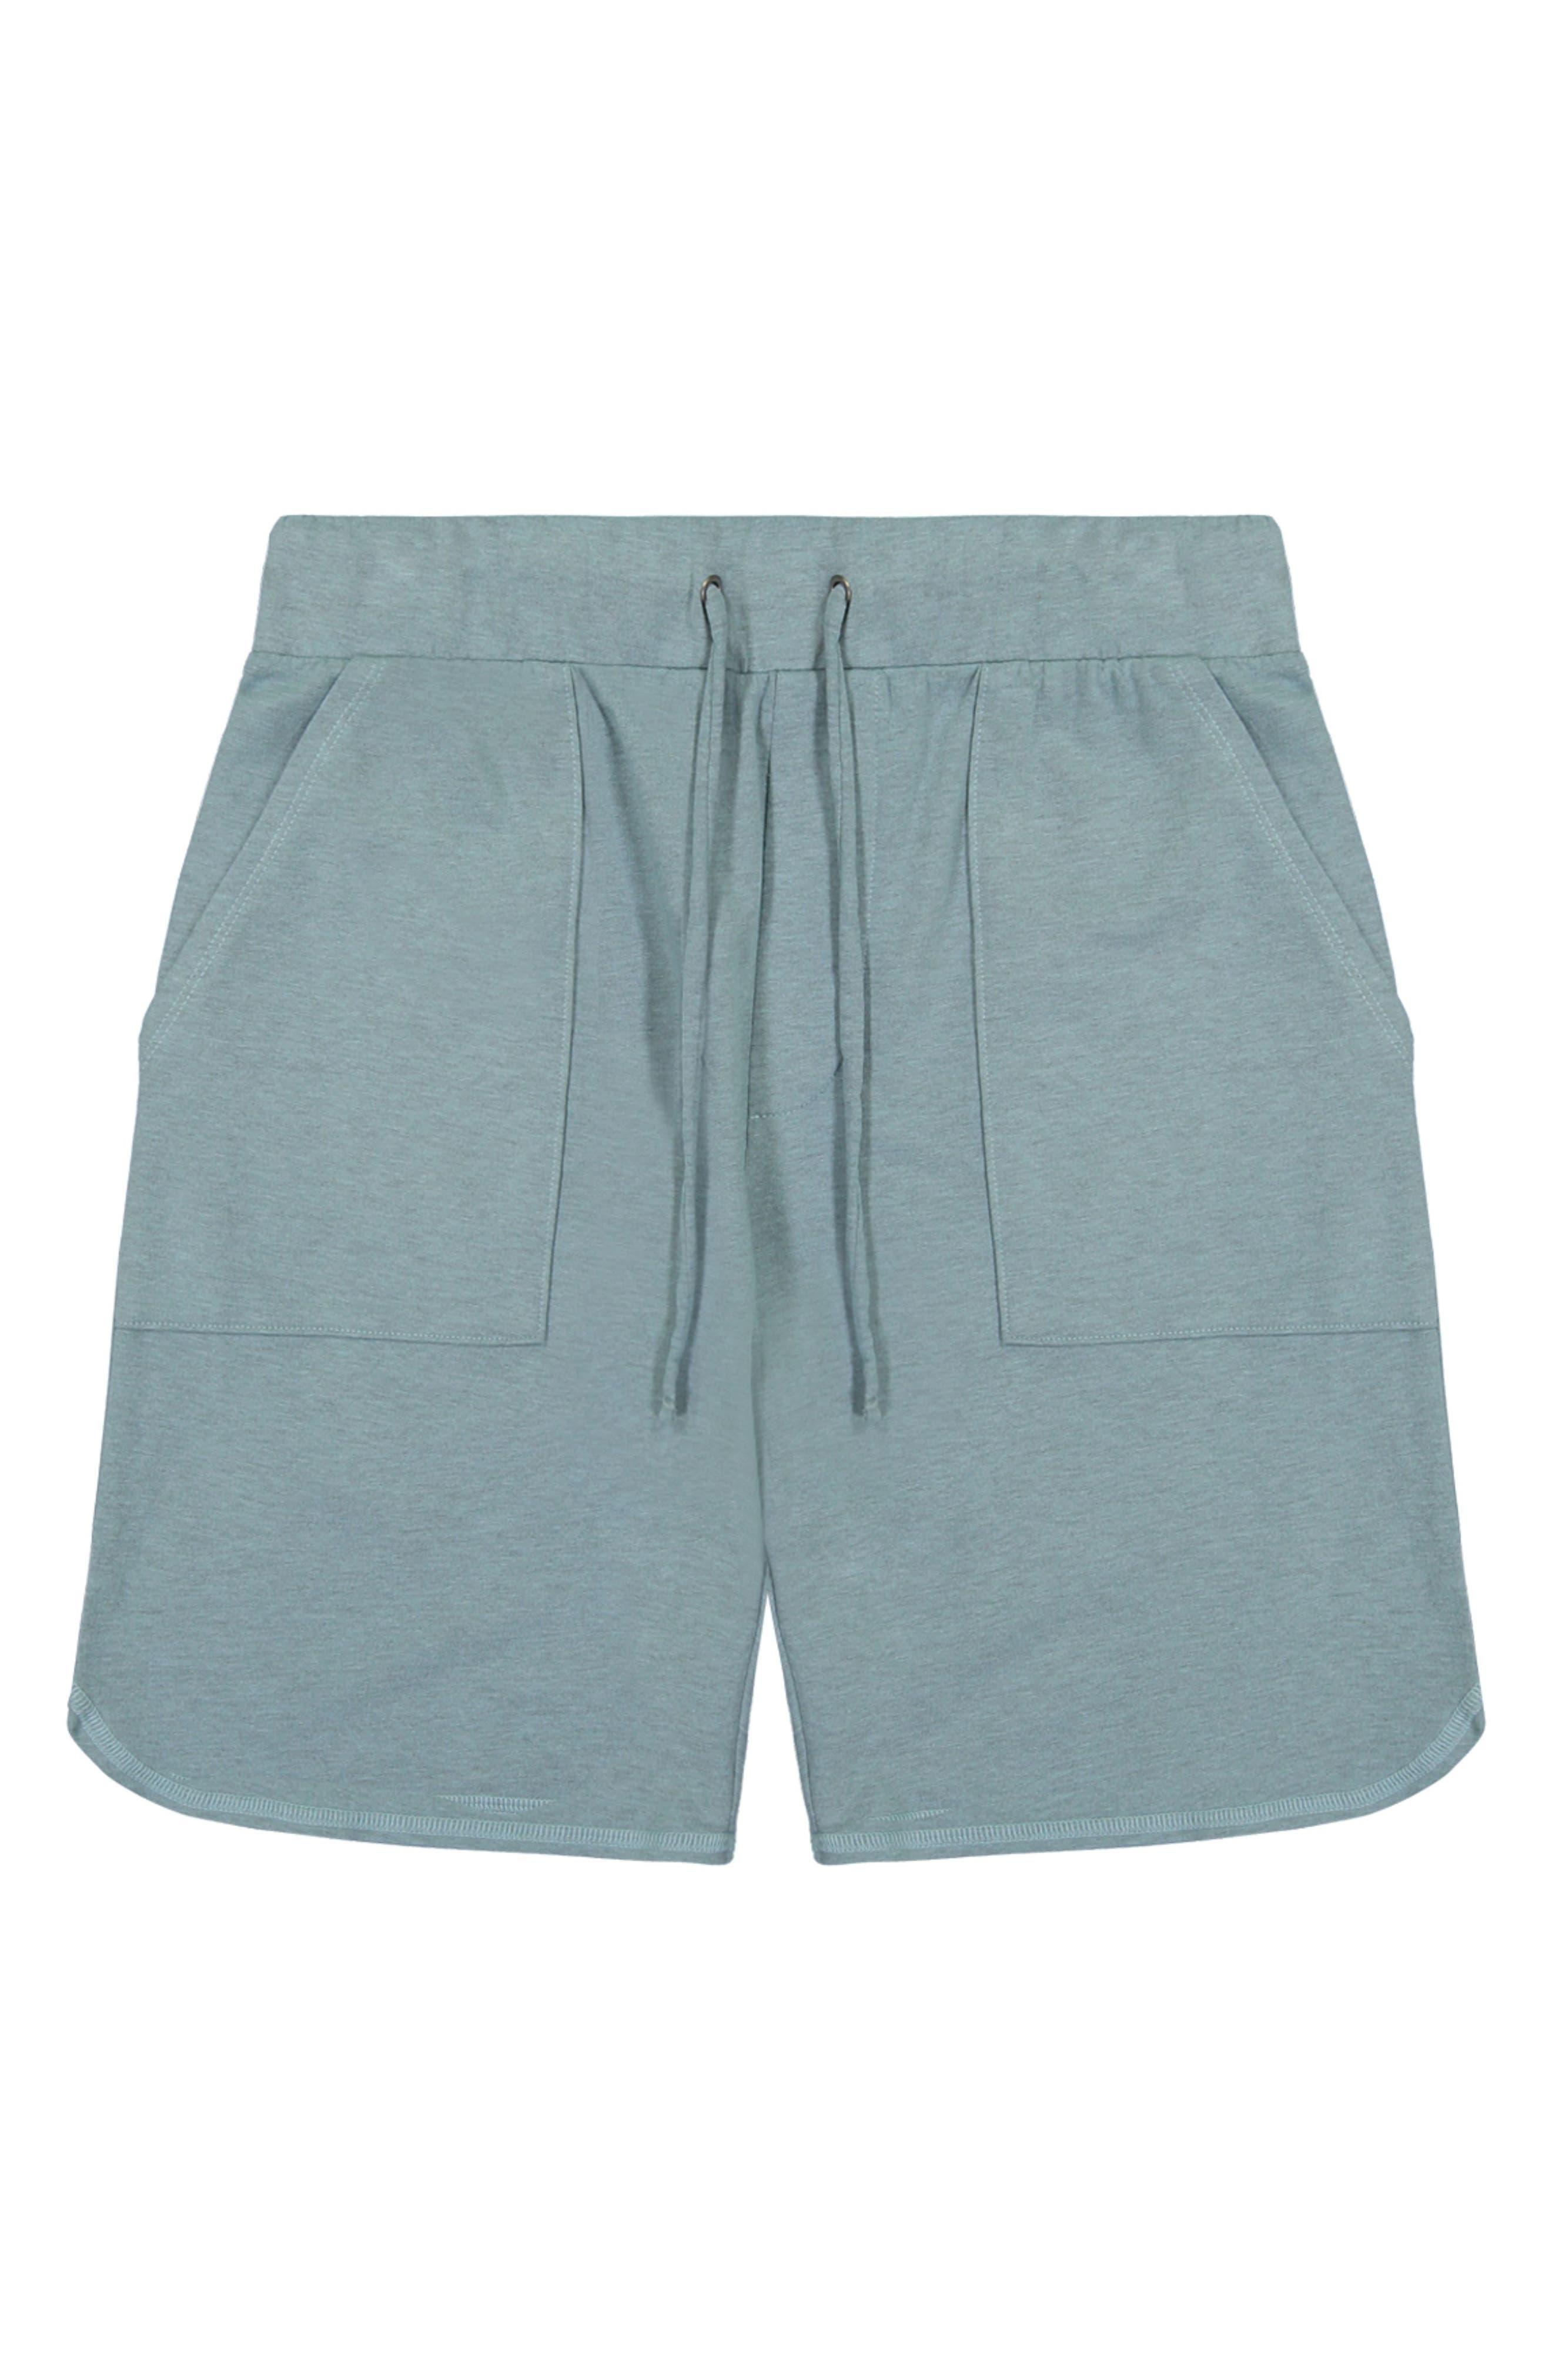 Men's Stretch Cotton Micro Terry Drawstring Shorts